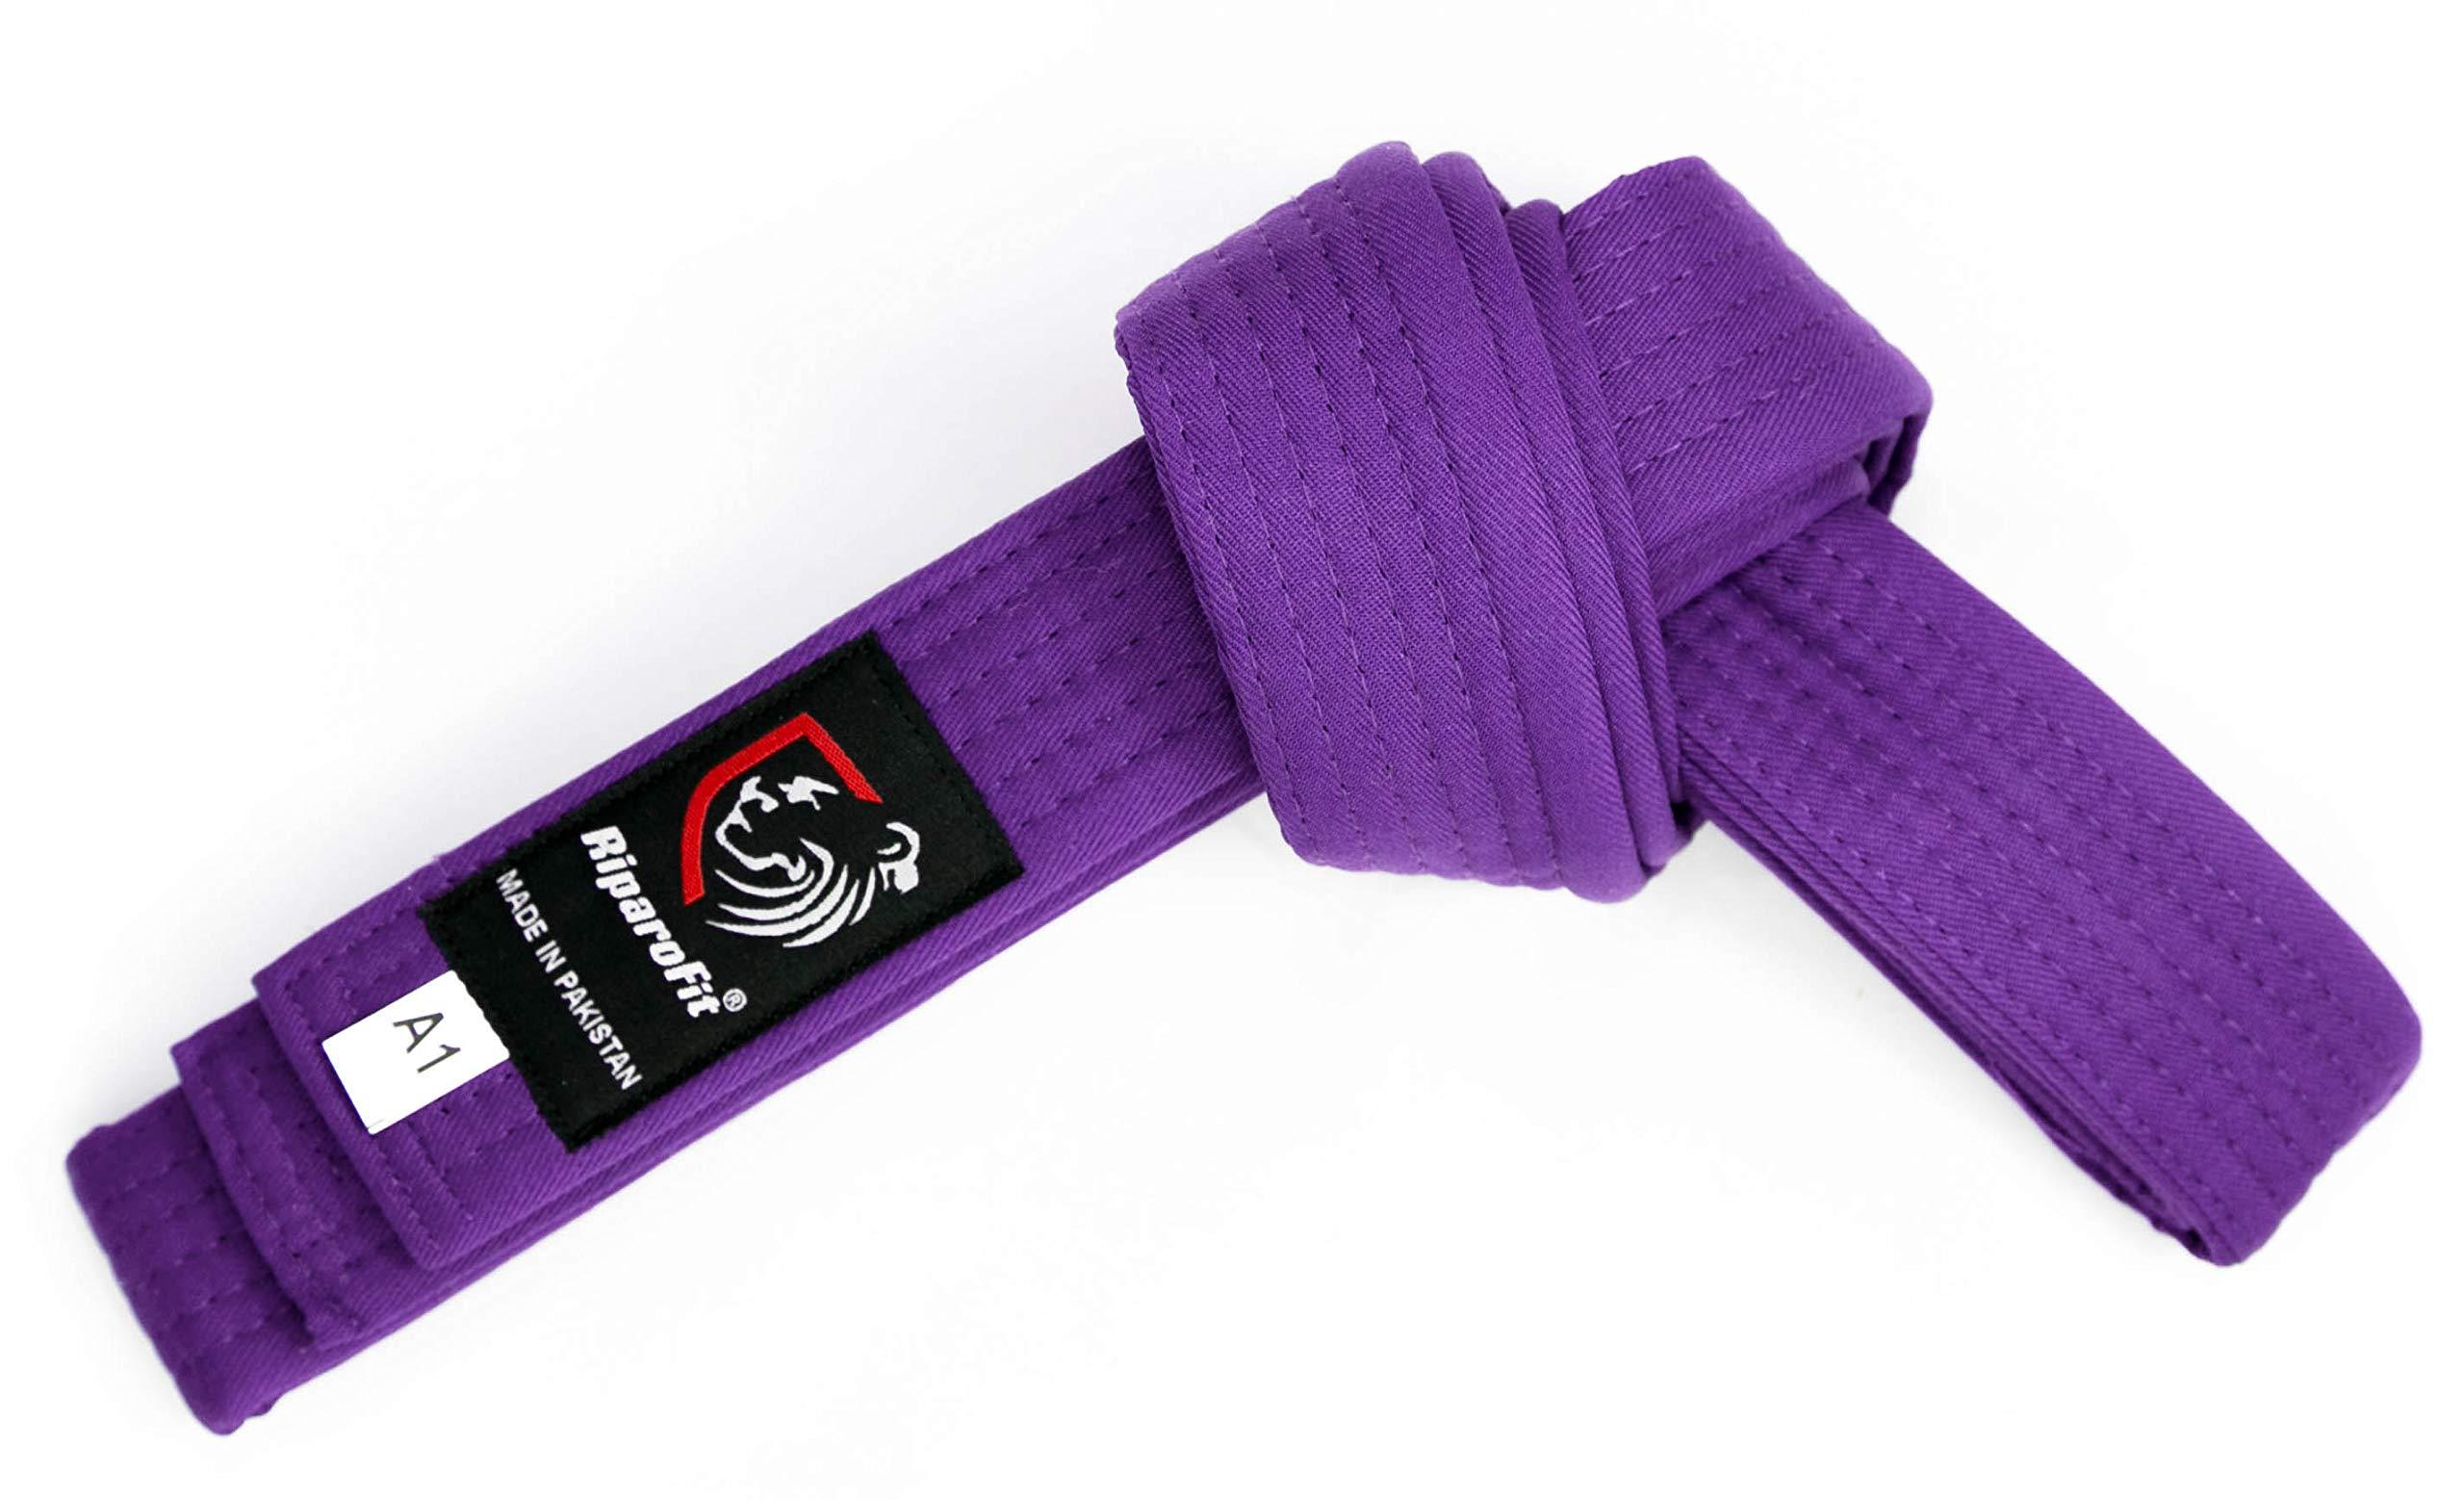 RiparoFit Brazilian Jiu Jitsu BJJ Pro Belts (Purple, A5) by RiparoFit